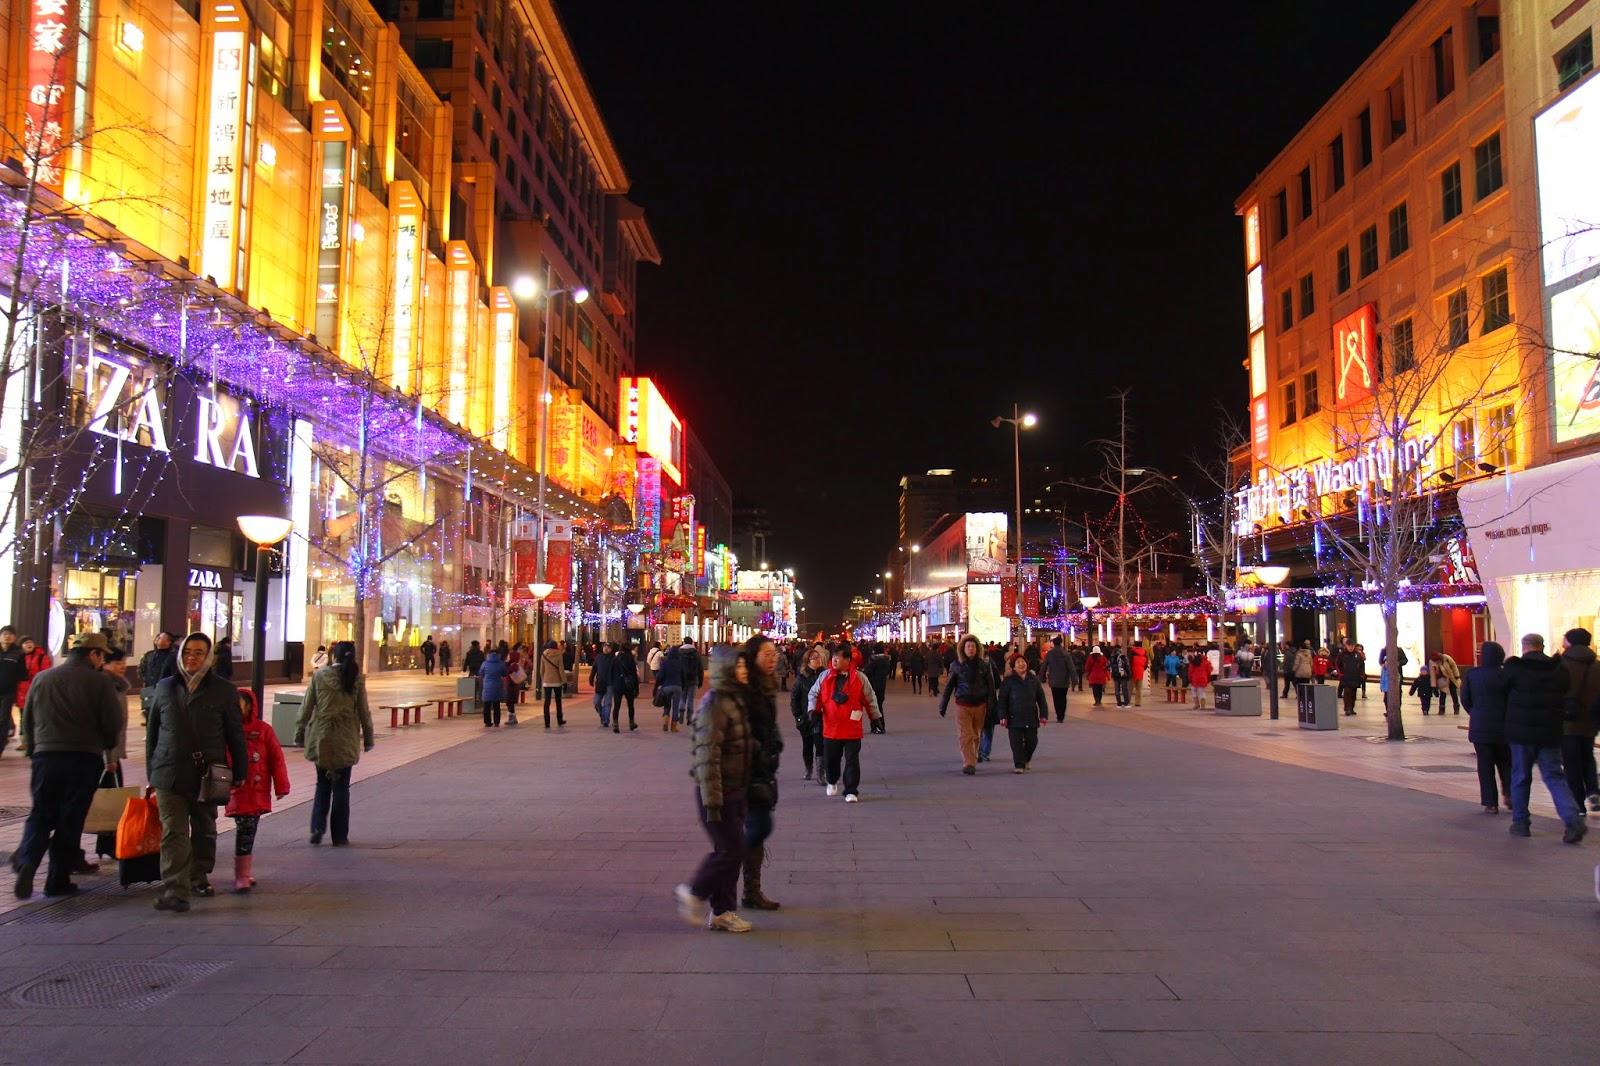 Where is FatBoy ?: Beijing - Wangfujing Snack Street